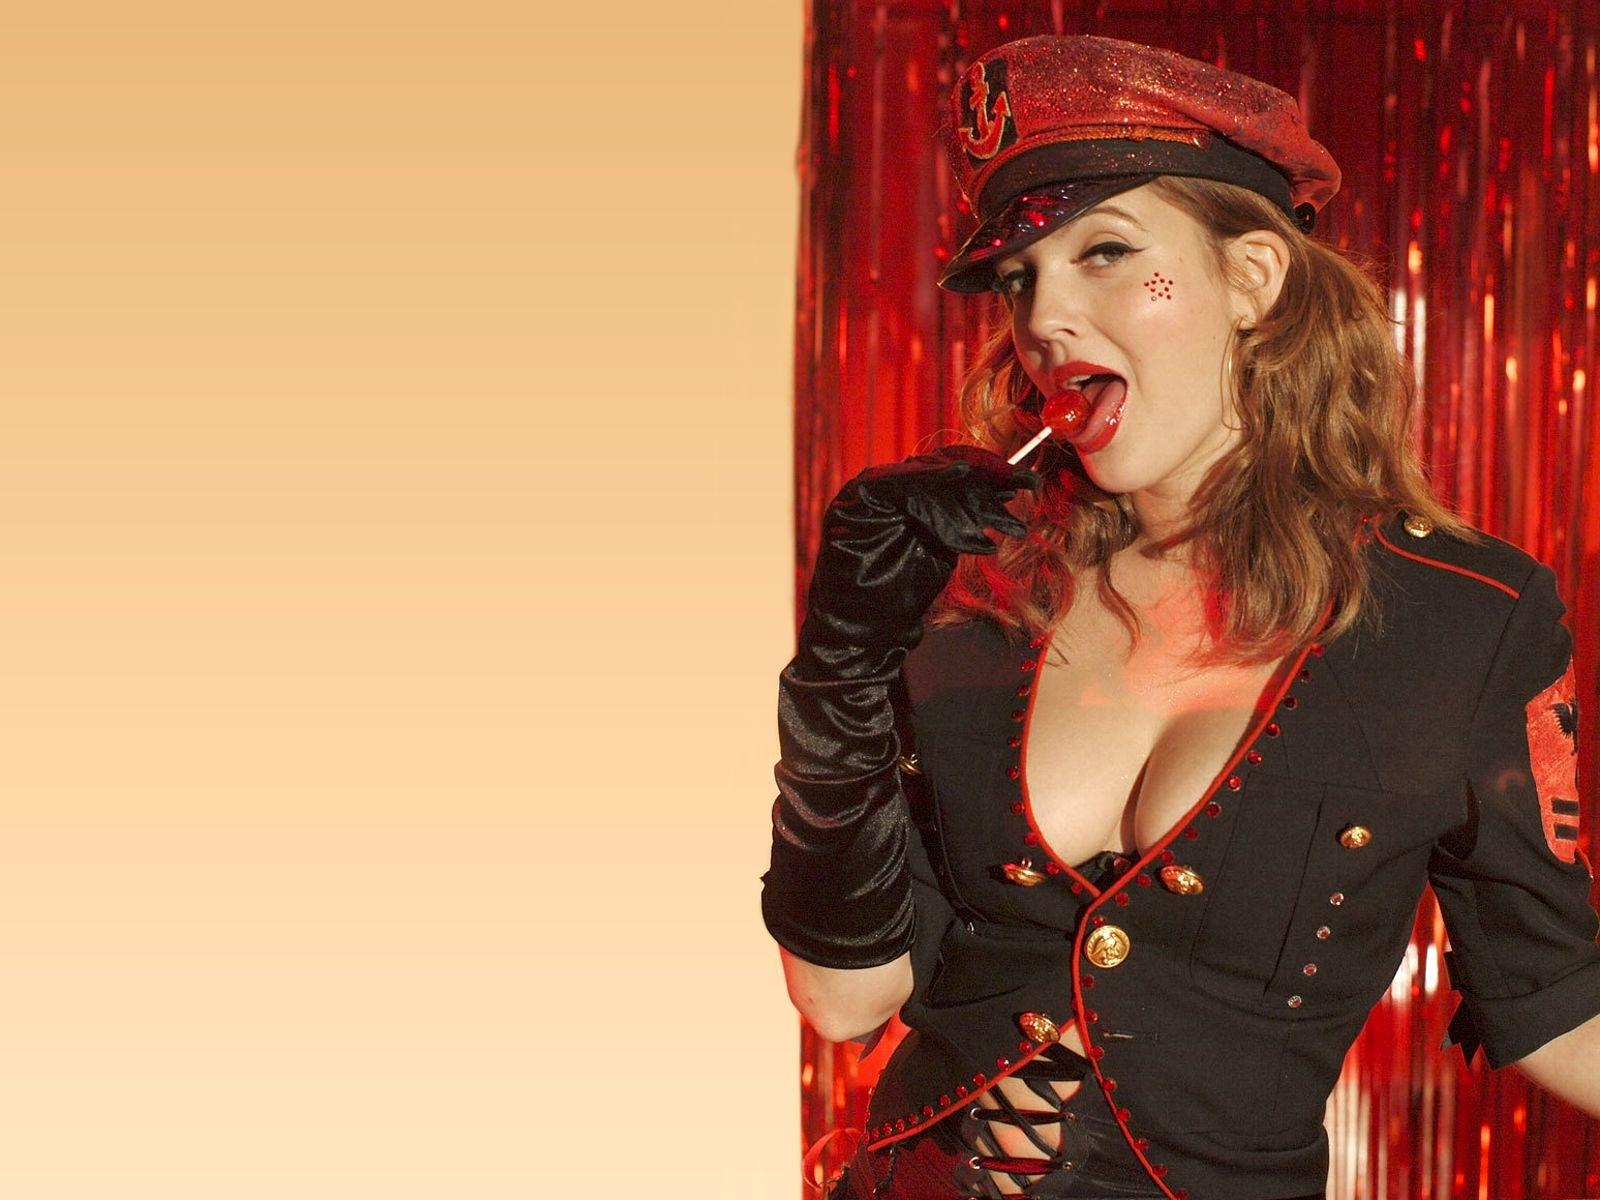 Wallpaper: Melissa Froio | FemaleMuscle, Female ...